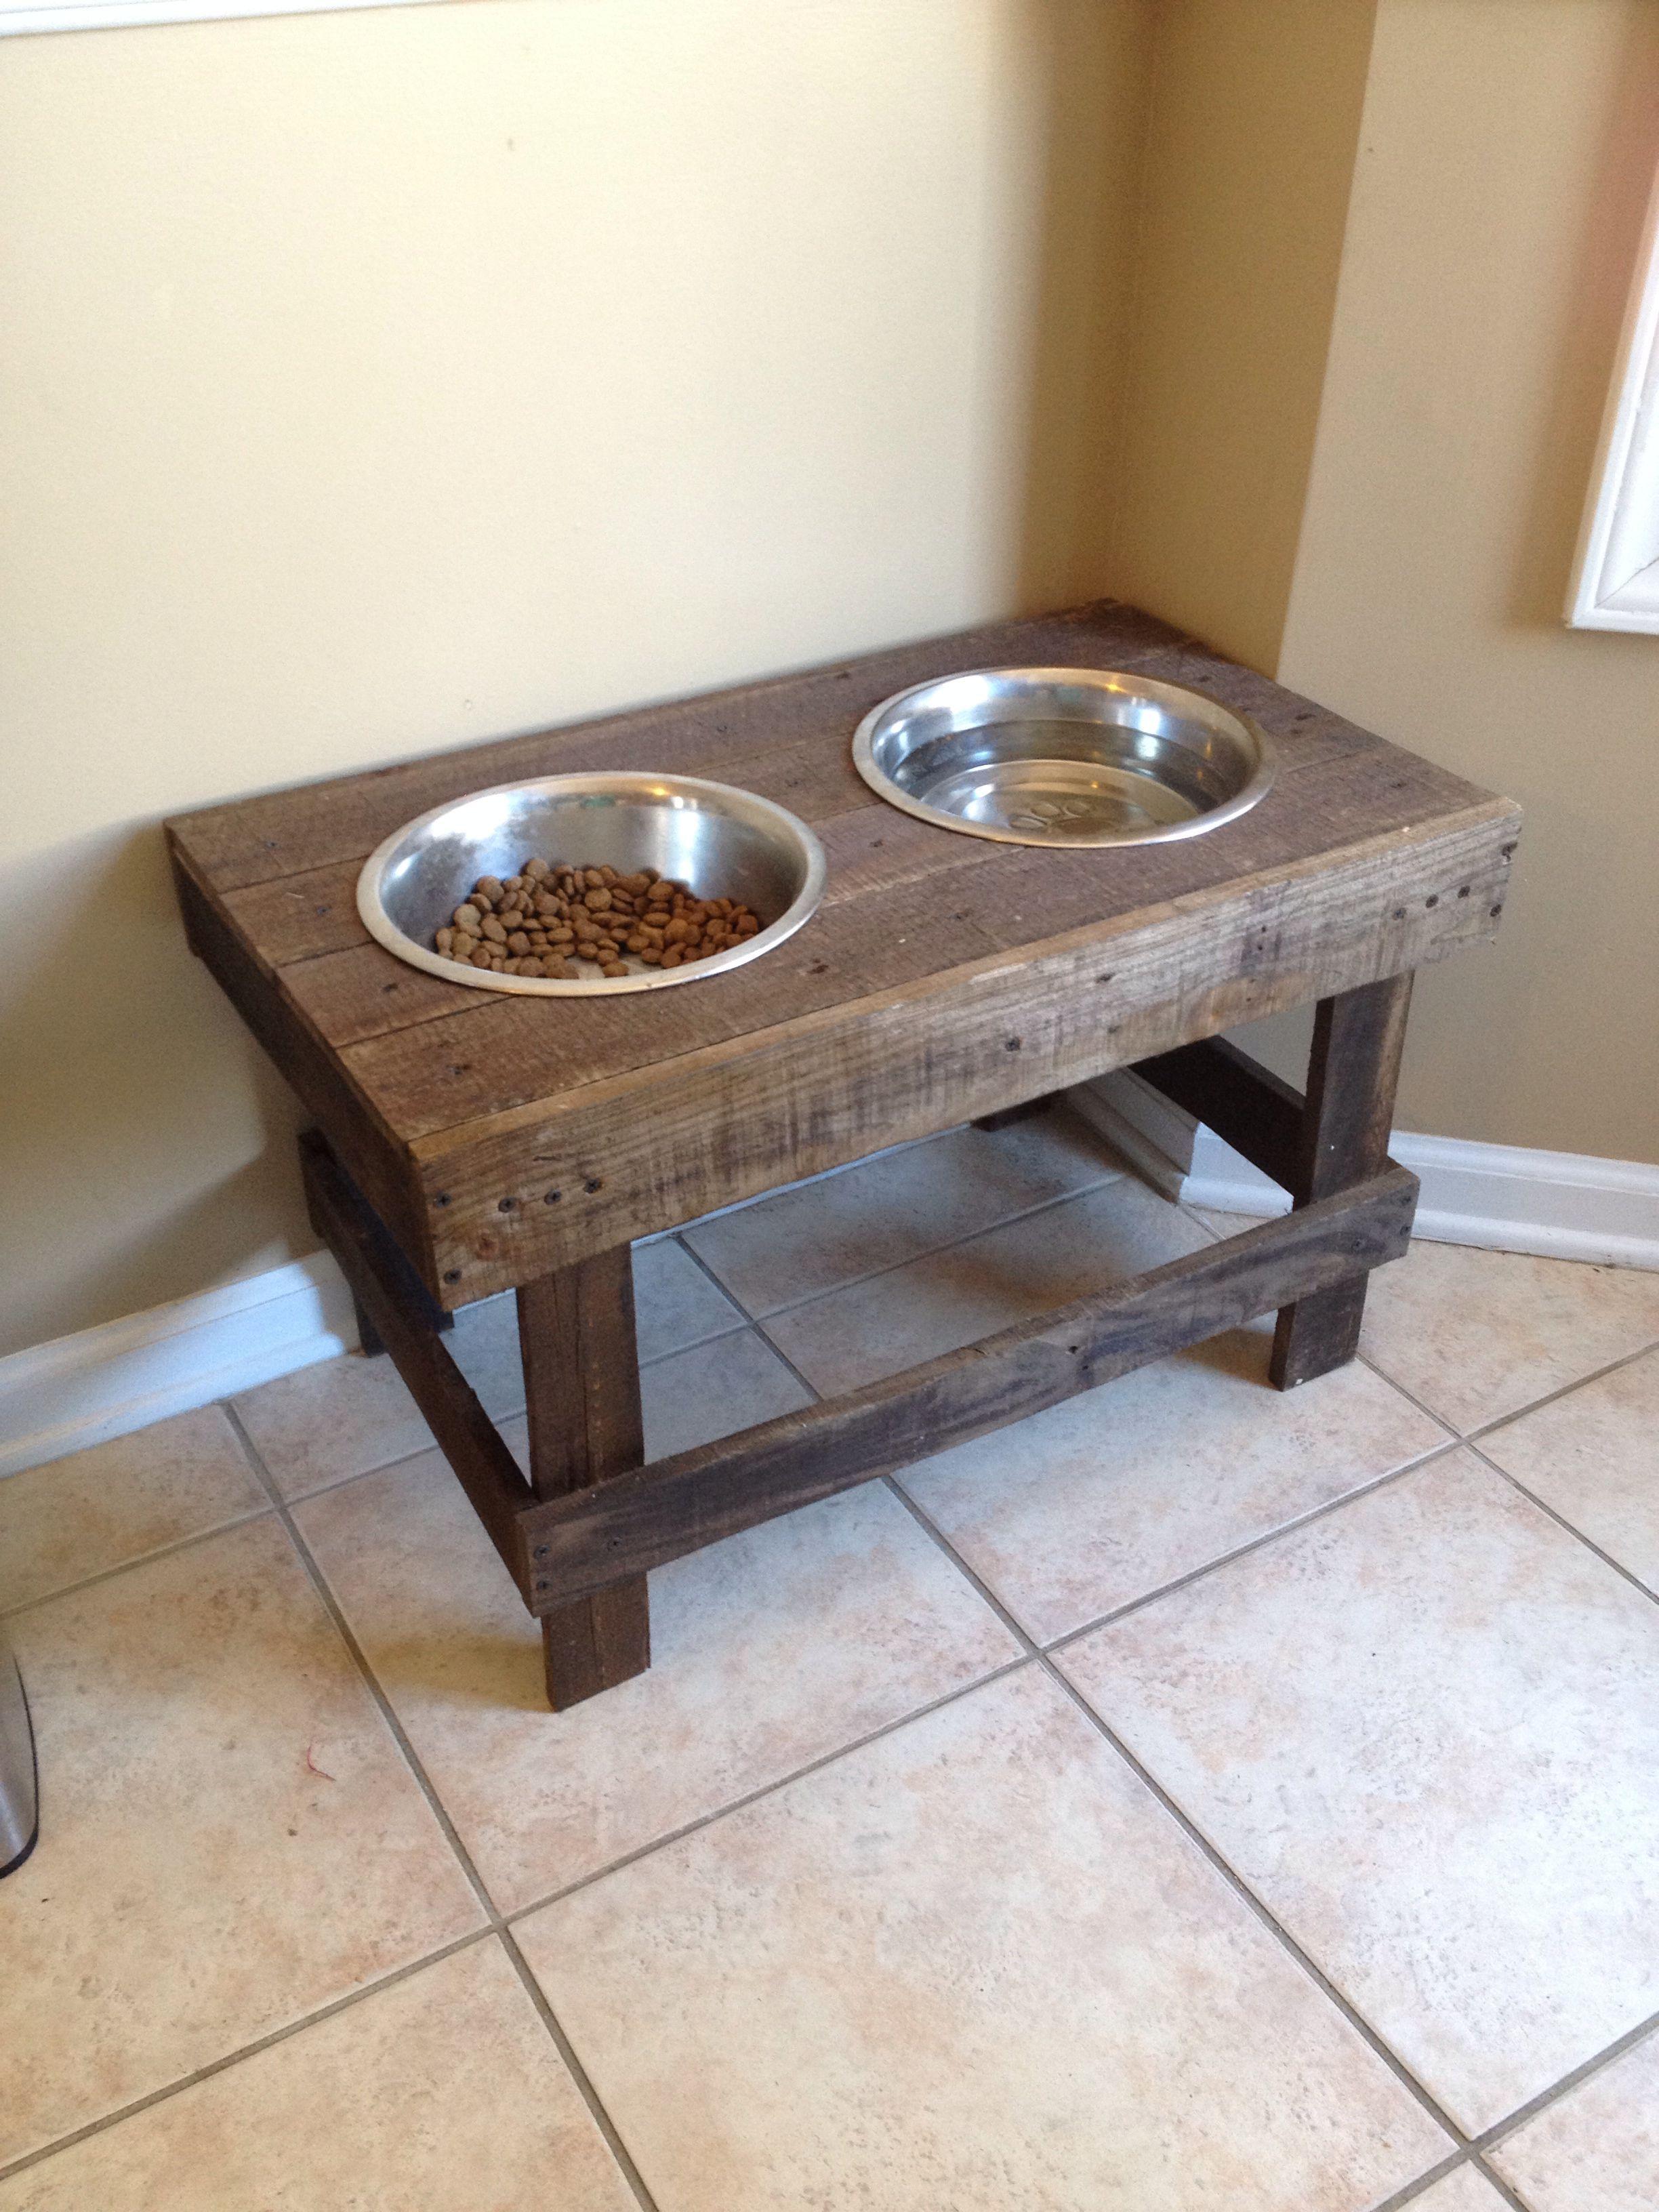 Diy Raised Dog Bowlspet Feeder - Pallet Project - Made